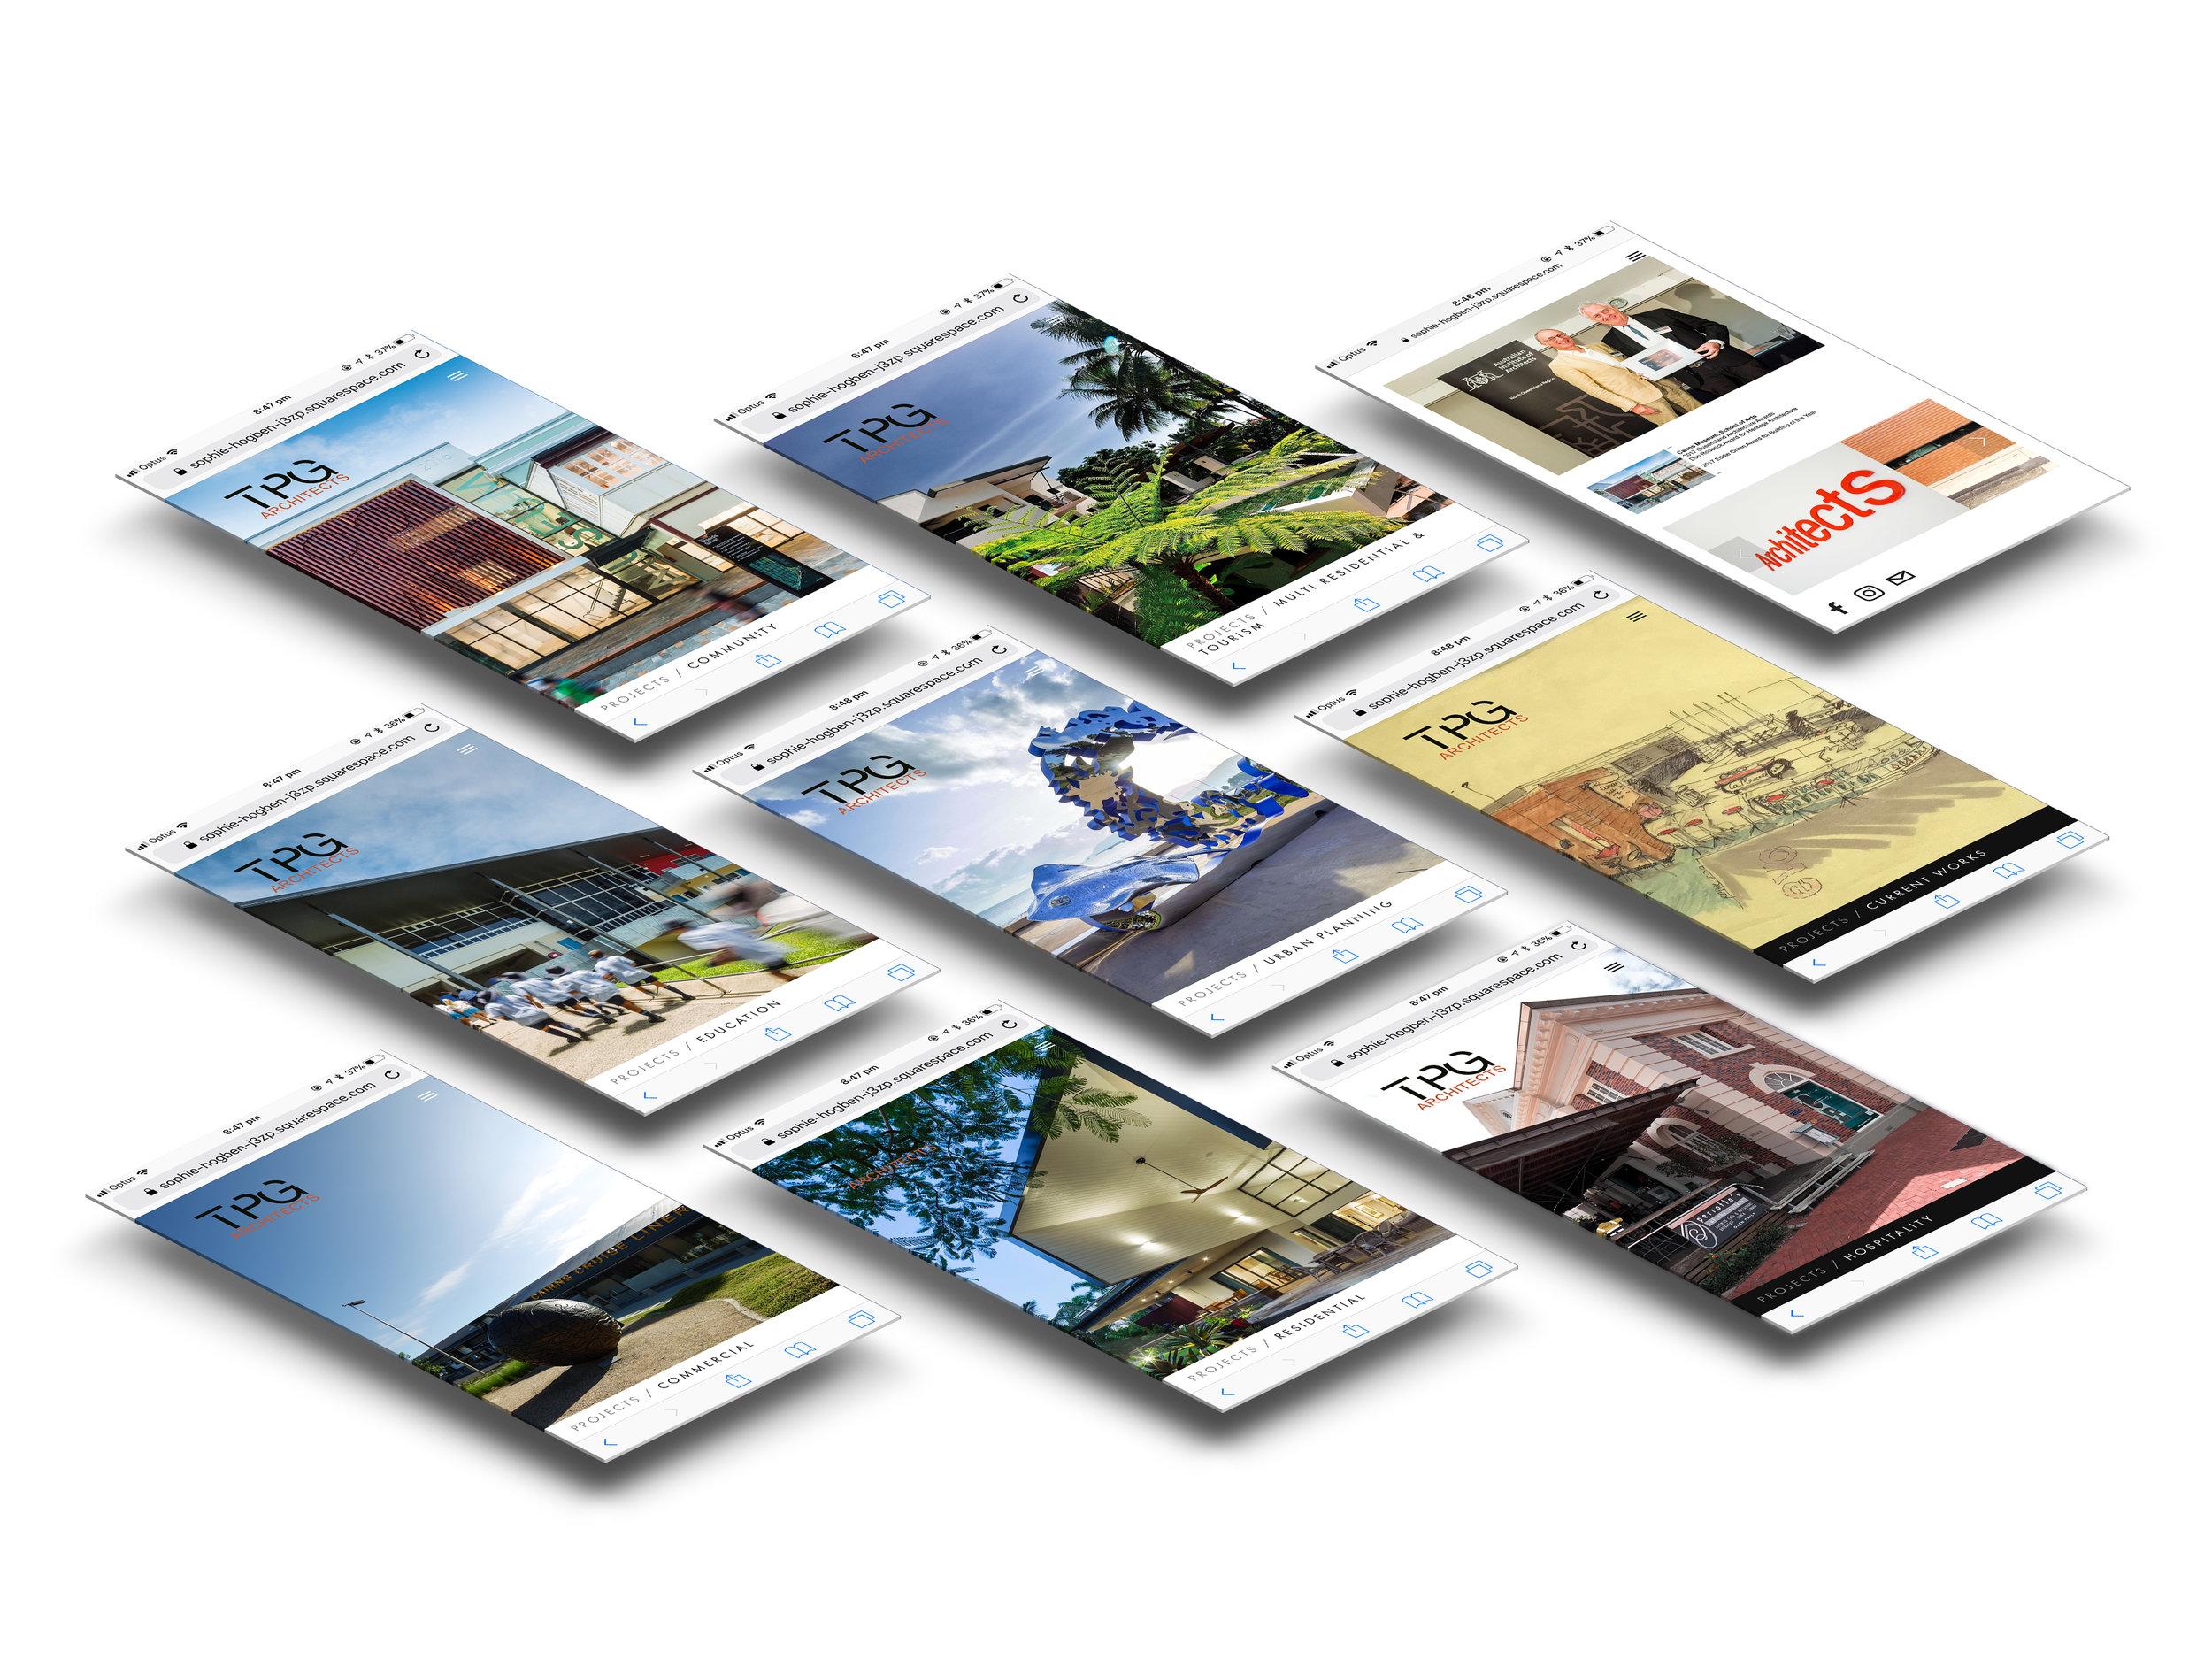 Perspective iphone mockup TPG website.jpg